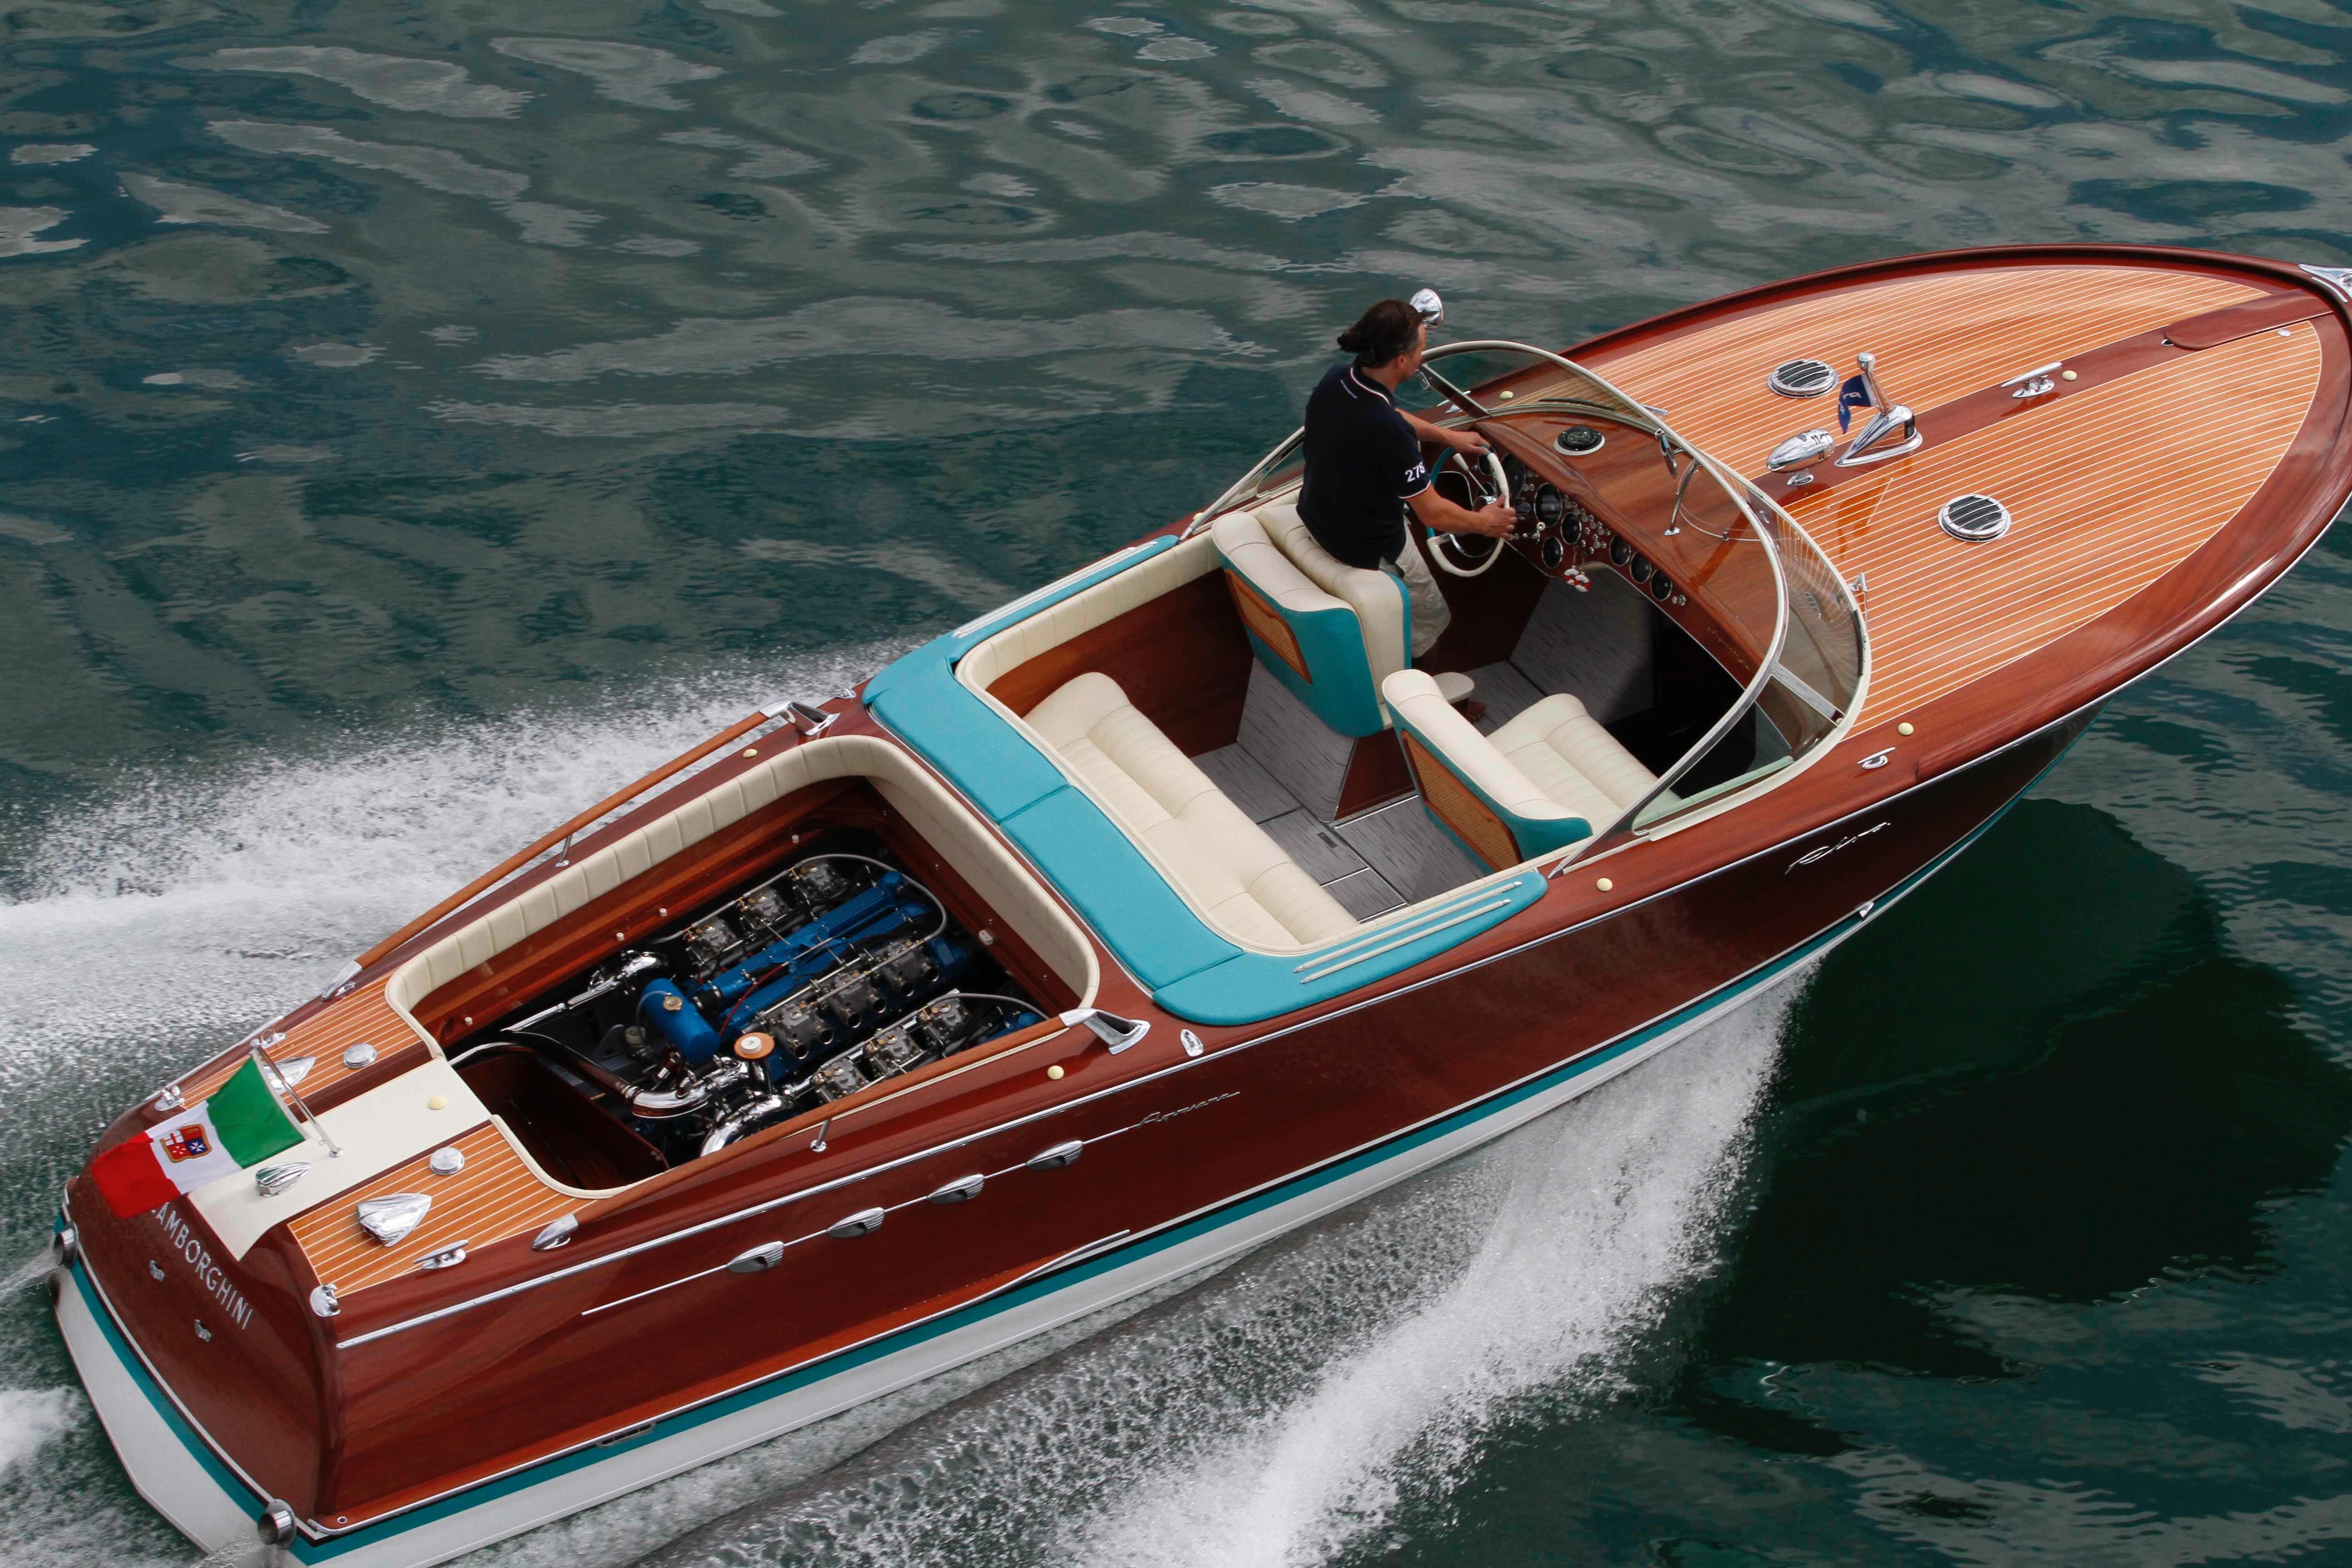 1968 Riva Aquarama Lamborghini Power Boat For Sale - www.yachtworld.com